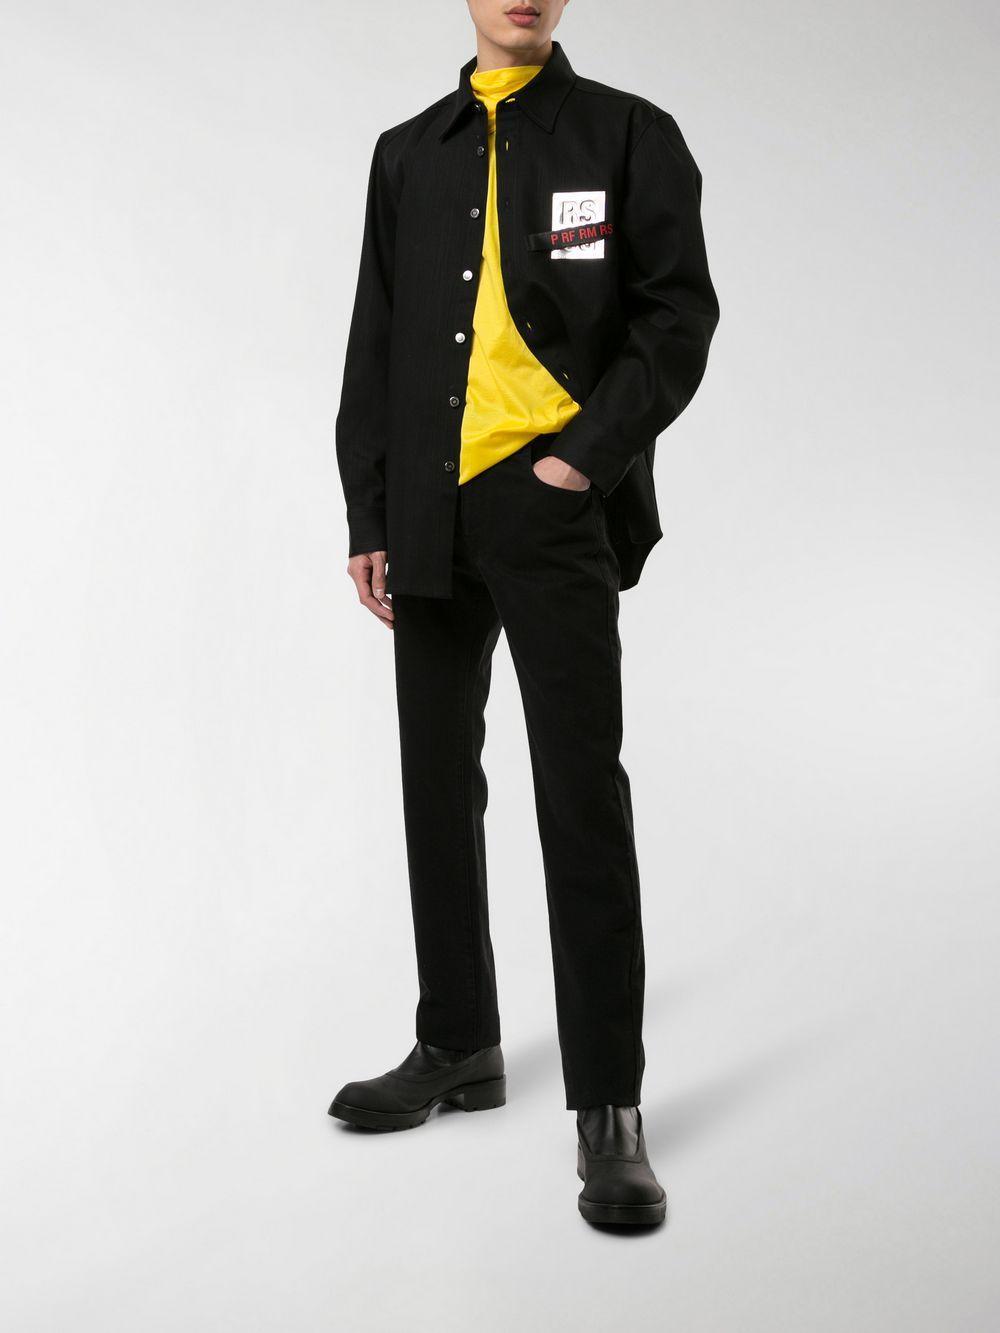 457a6e2c73 Lyst - Raf Simons Logo Patch Denim Shirt in Black for Men - Save 7%